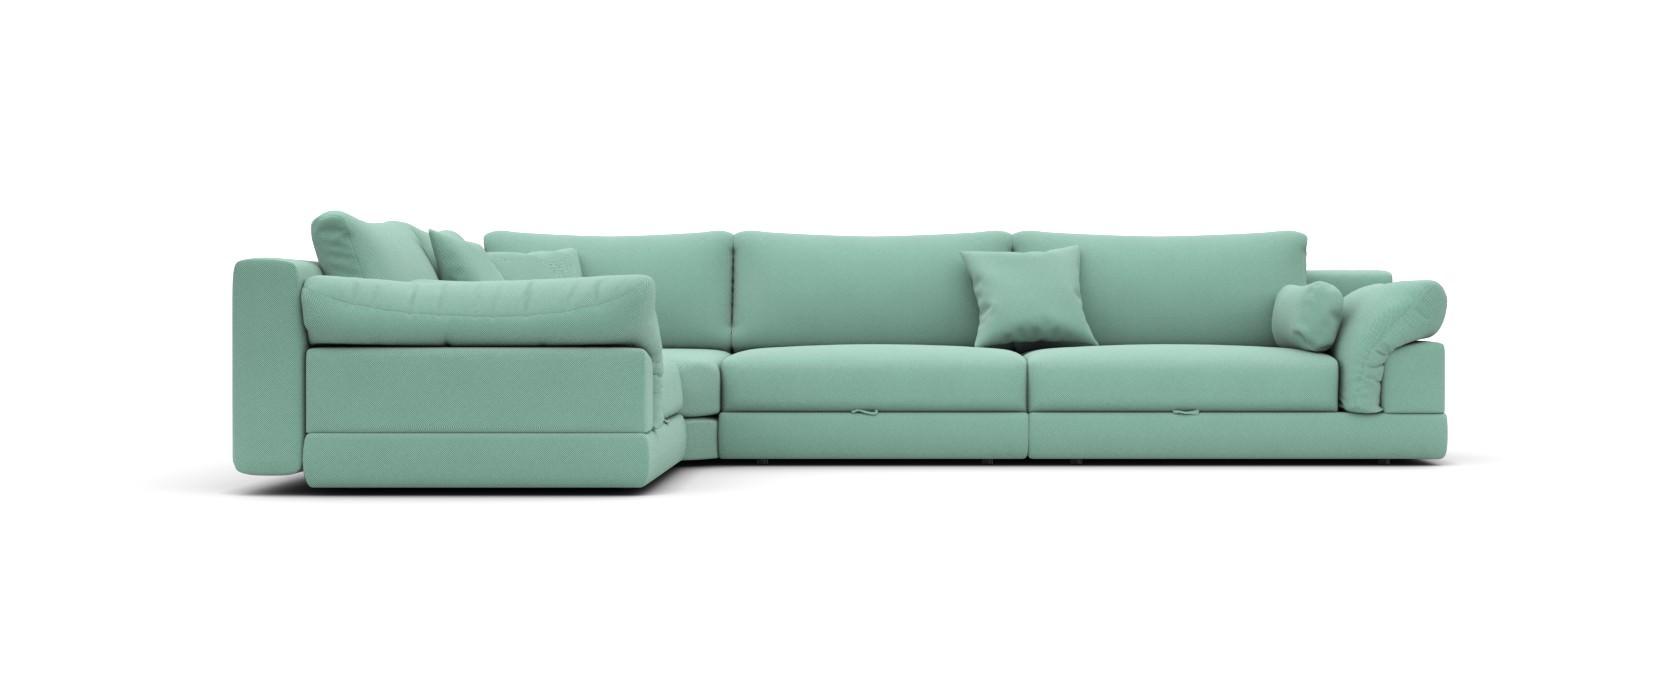 Модульний диван Claudia 355x255 - Pufetto